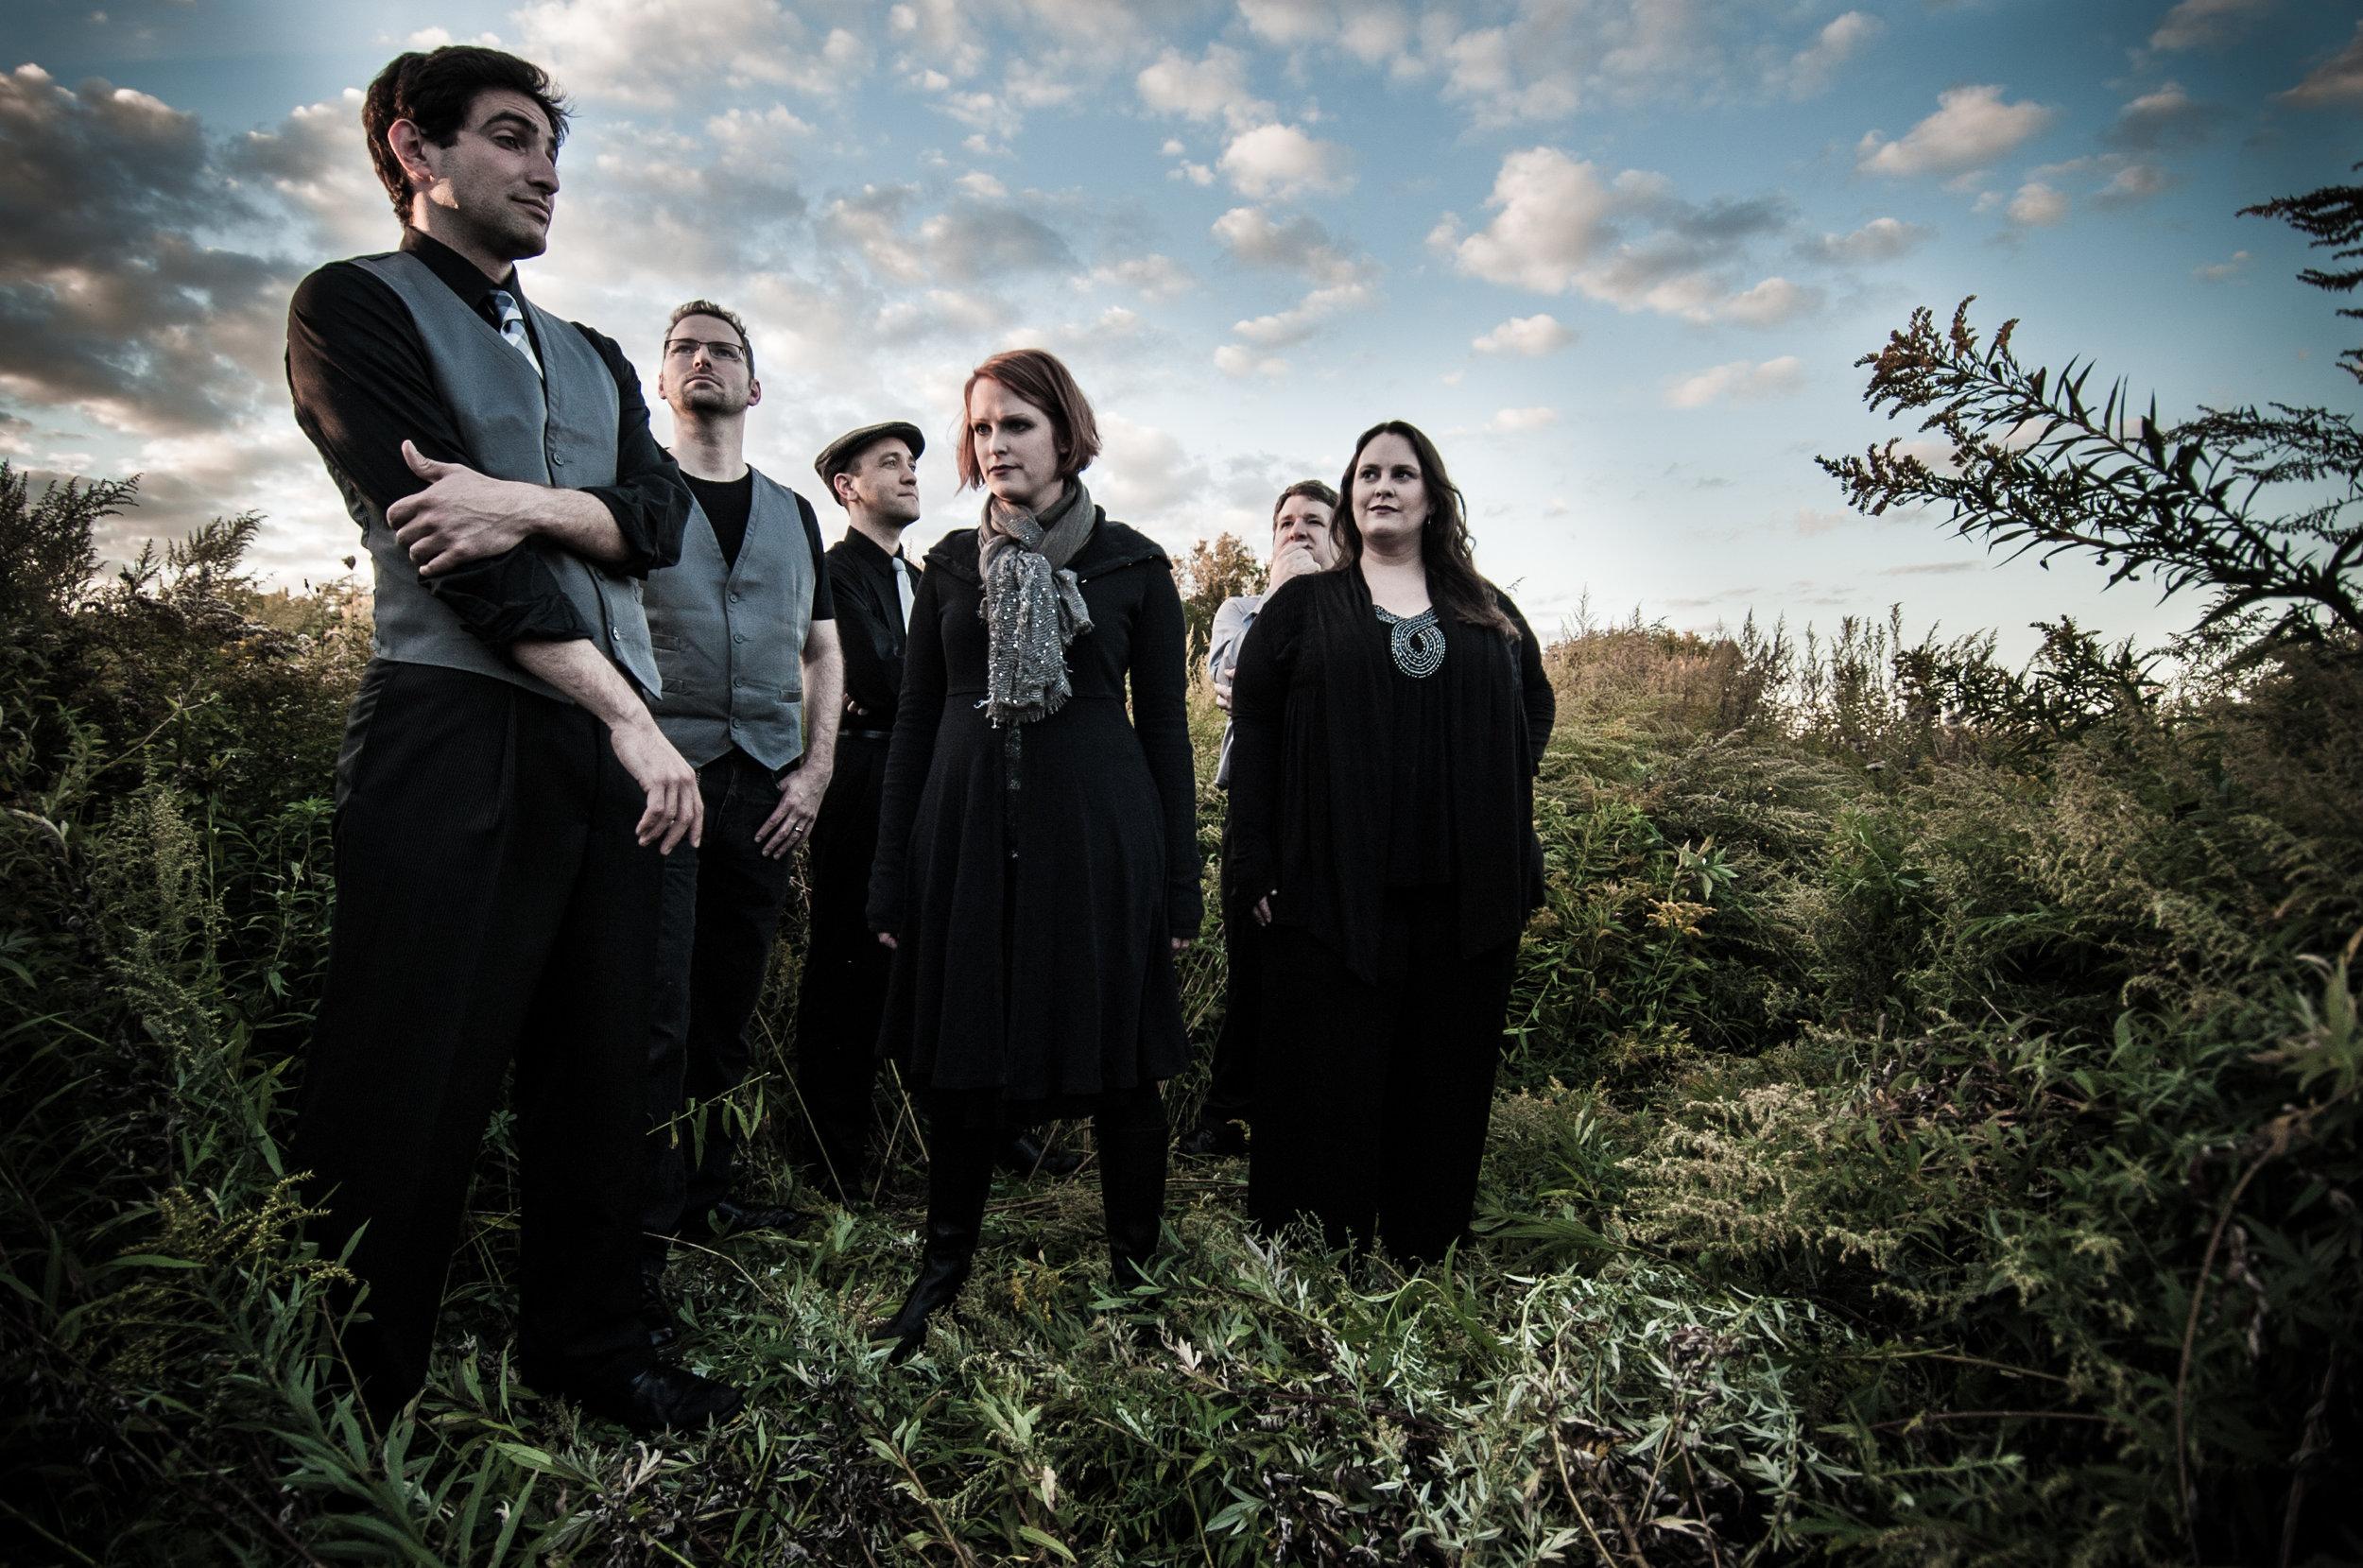 Josh Schrager (Tenor), Jamie Howe (Vocal Percussion),Tom West (Tenor), Amy Howe (Soprano), Joseph Gooch (Bass), Jennifer Steinberg (Alto)